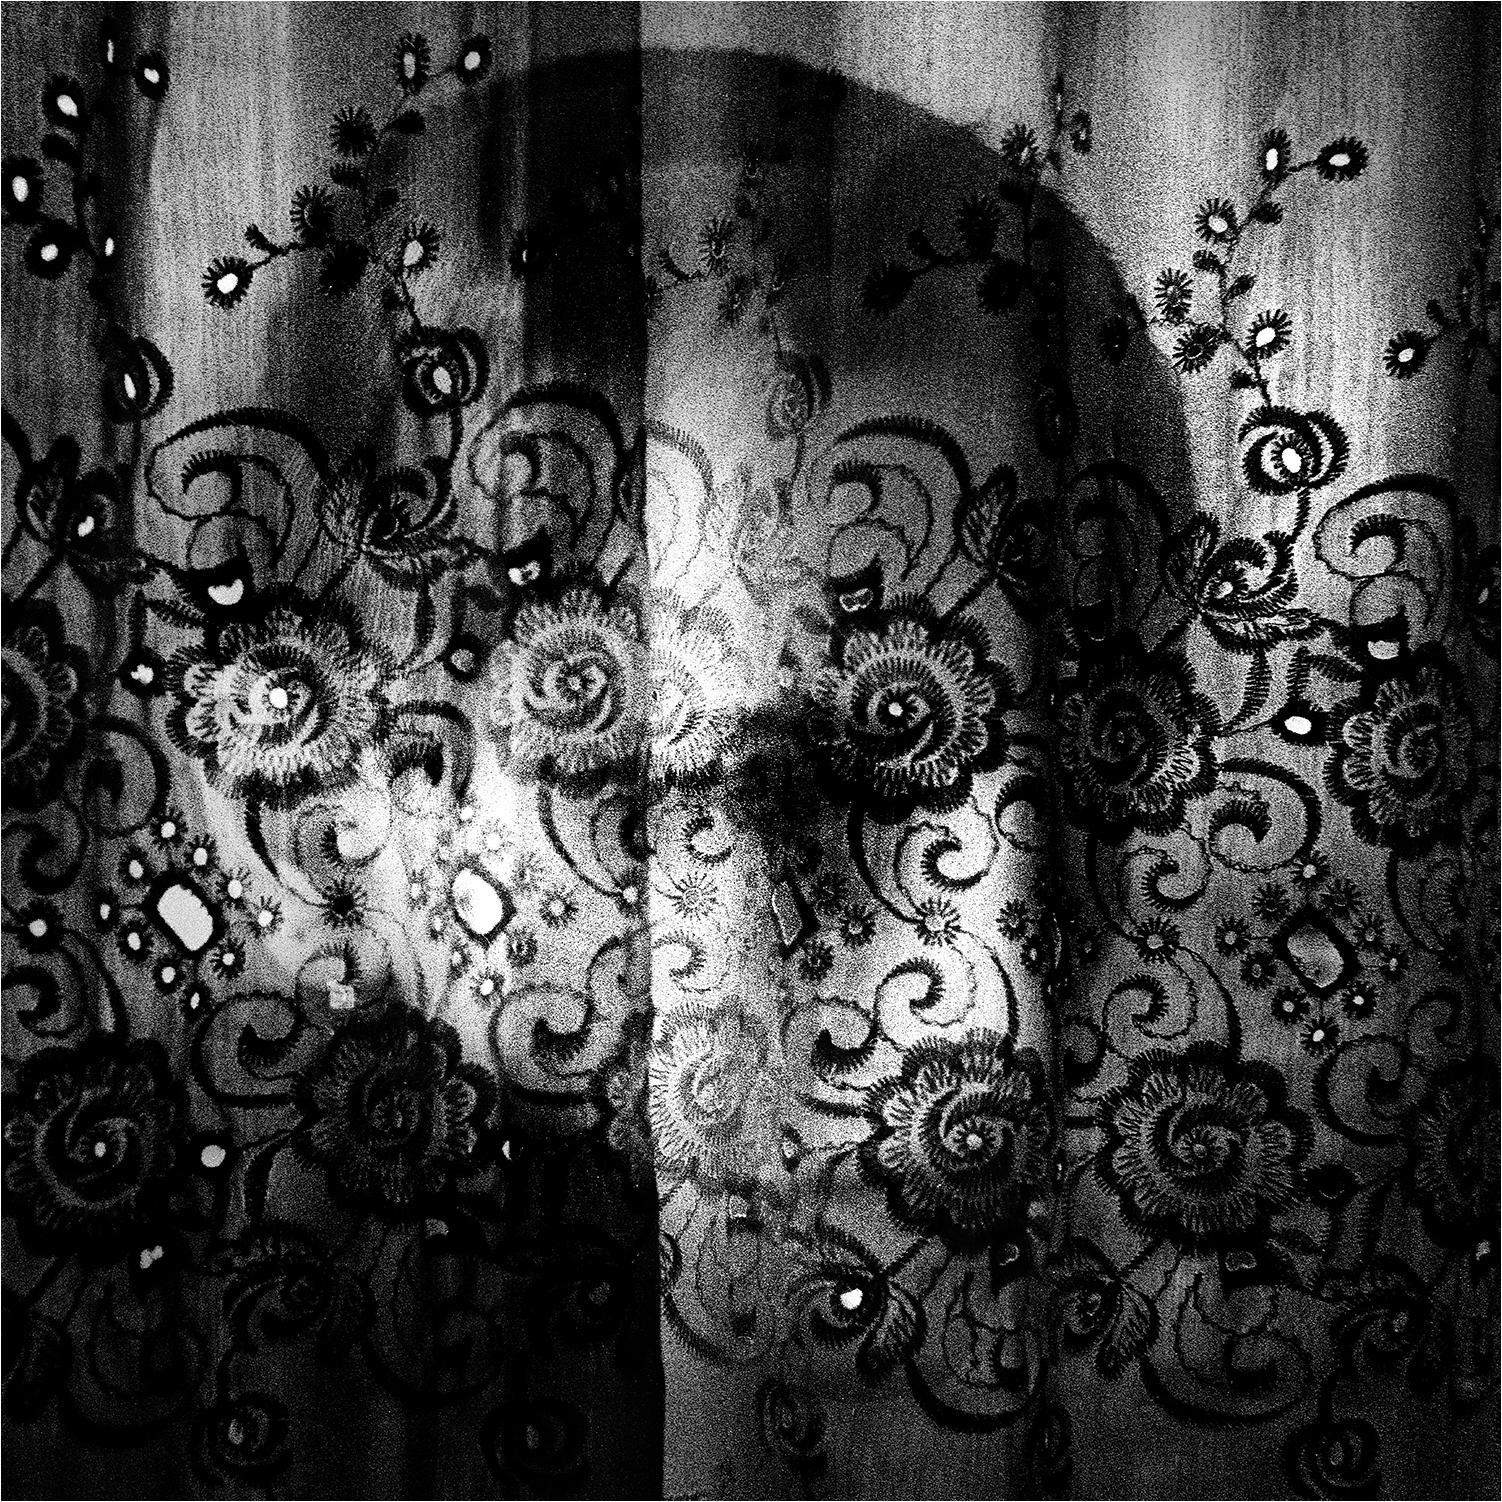 #Behind the curtain